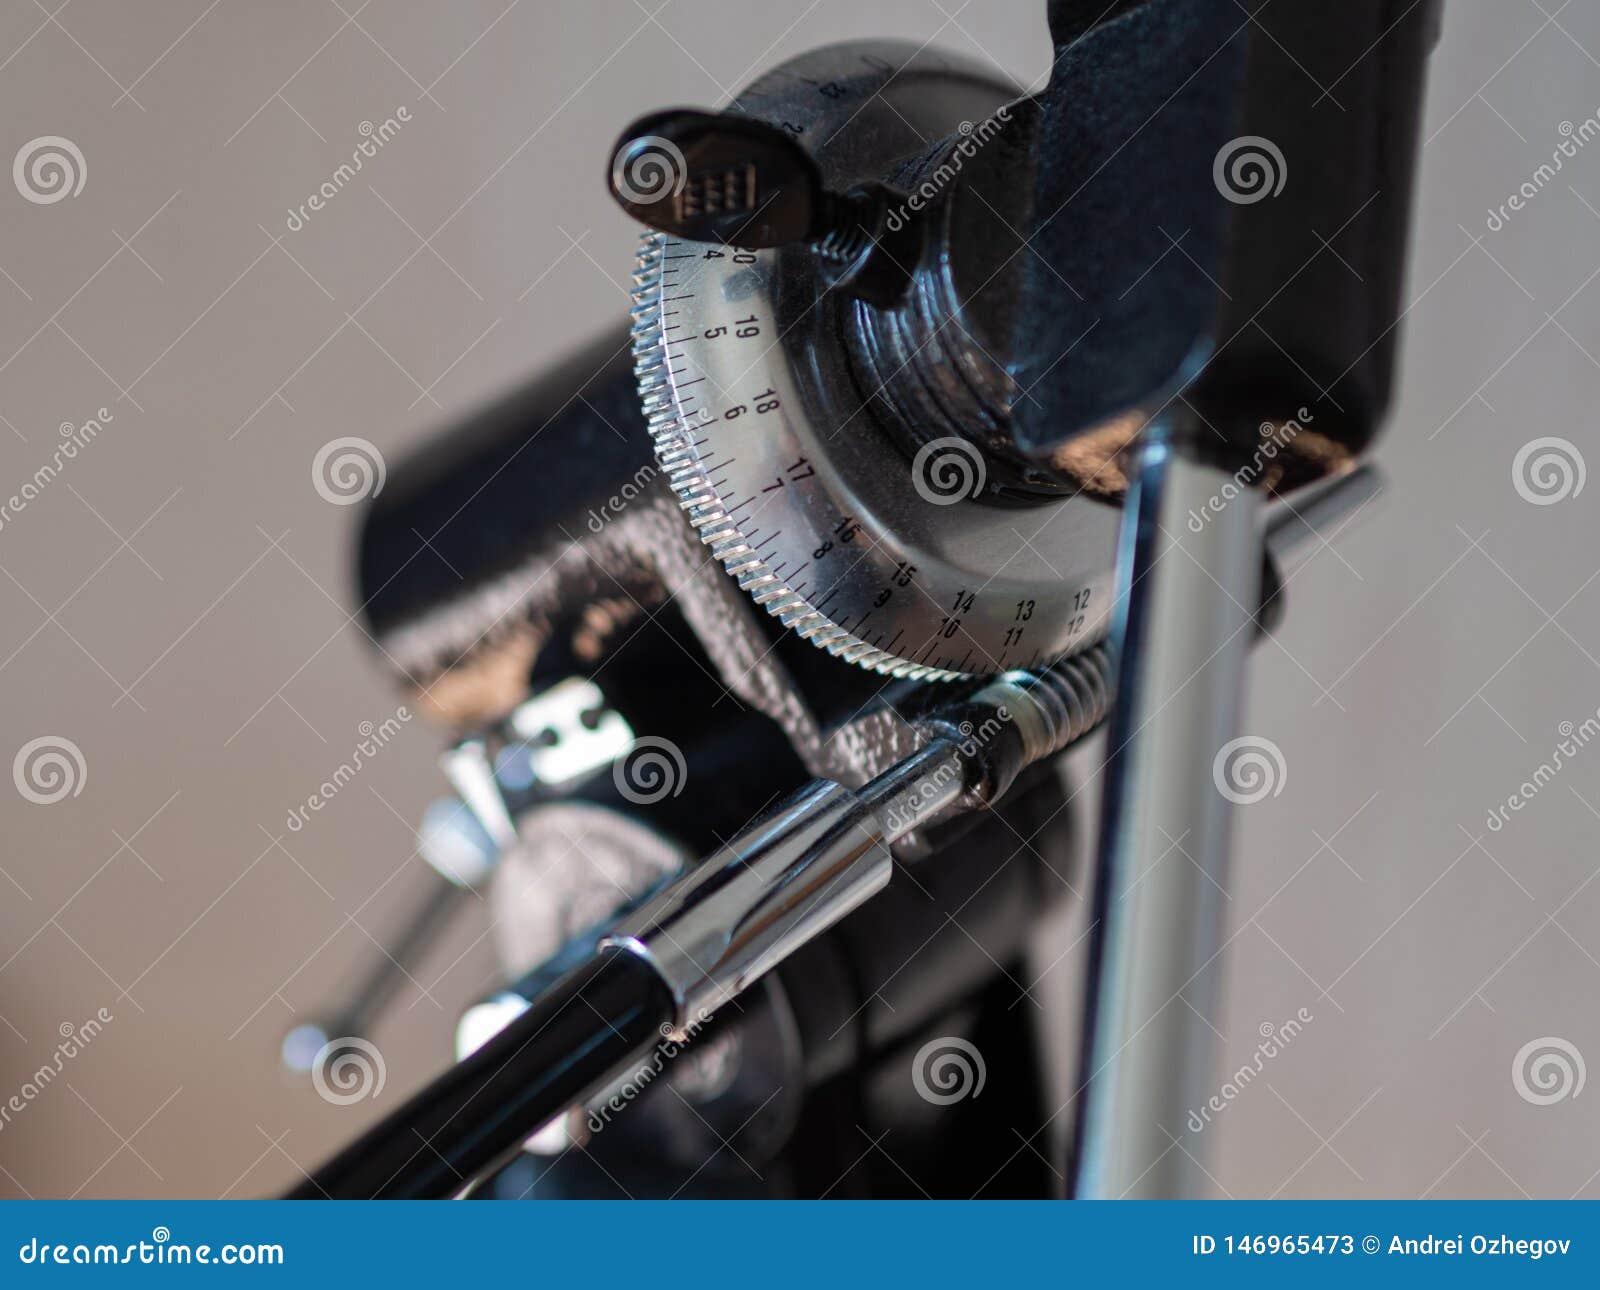 Azimuth mount closeup